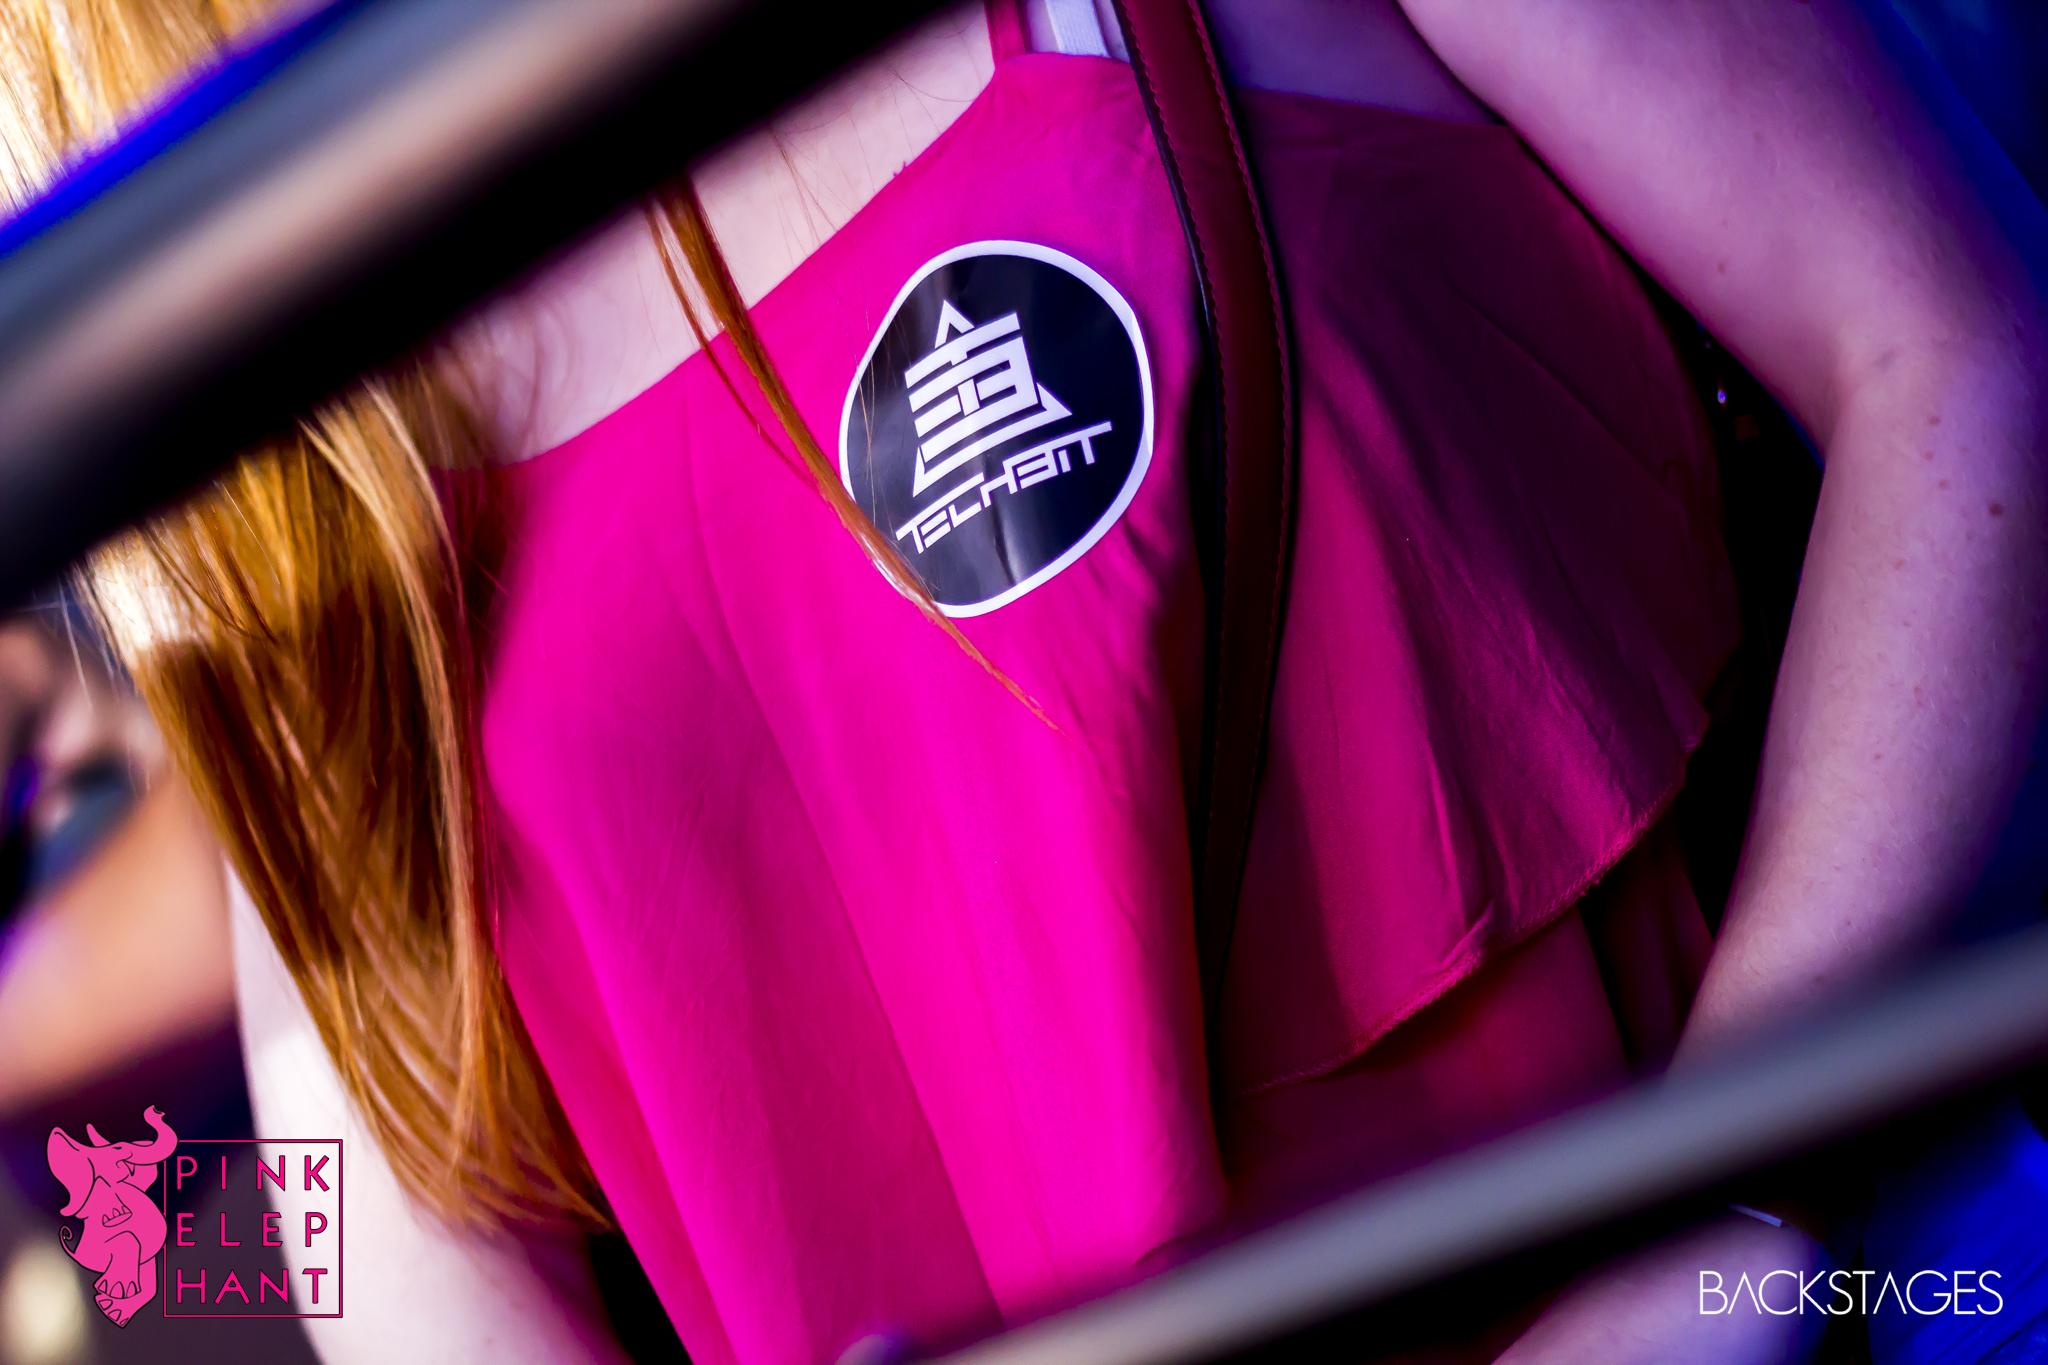 Pink-elephant-club-sorocaba-revista-backstages-foto-kenzi-marinho (27)